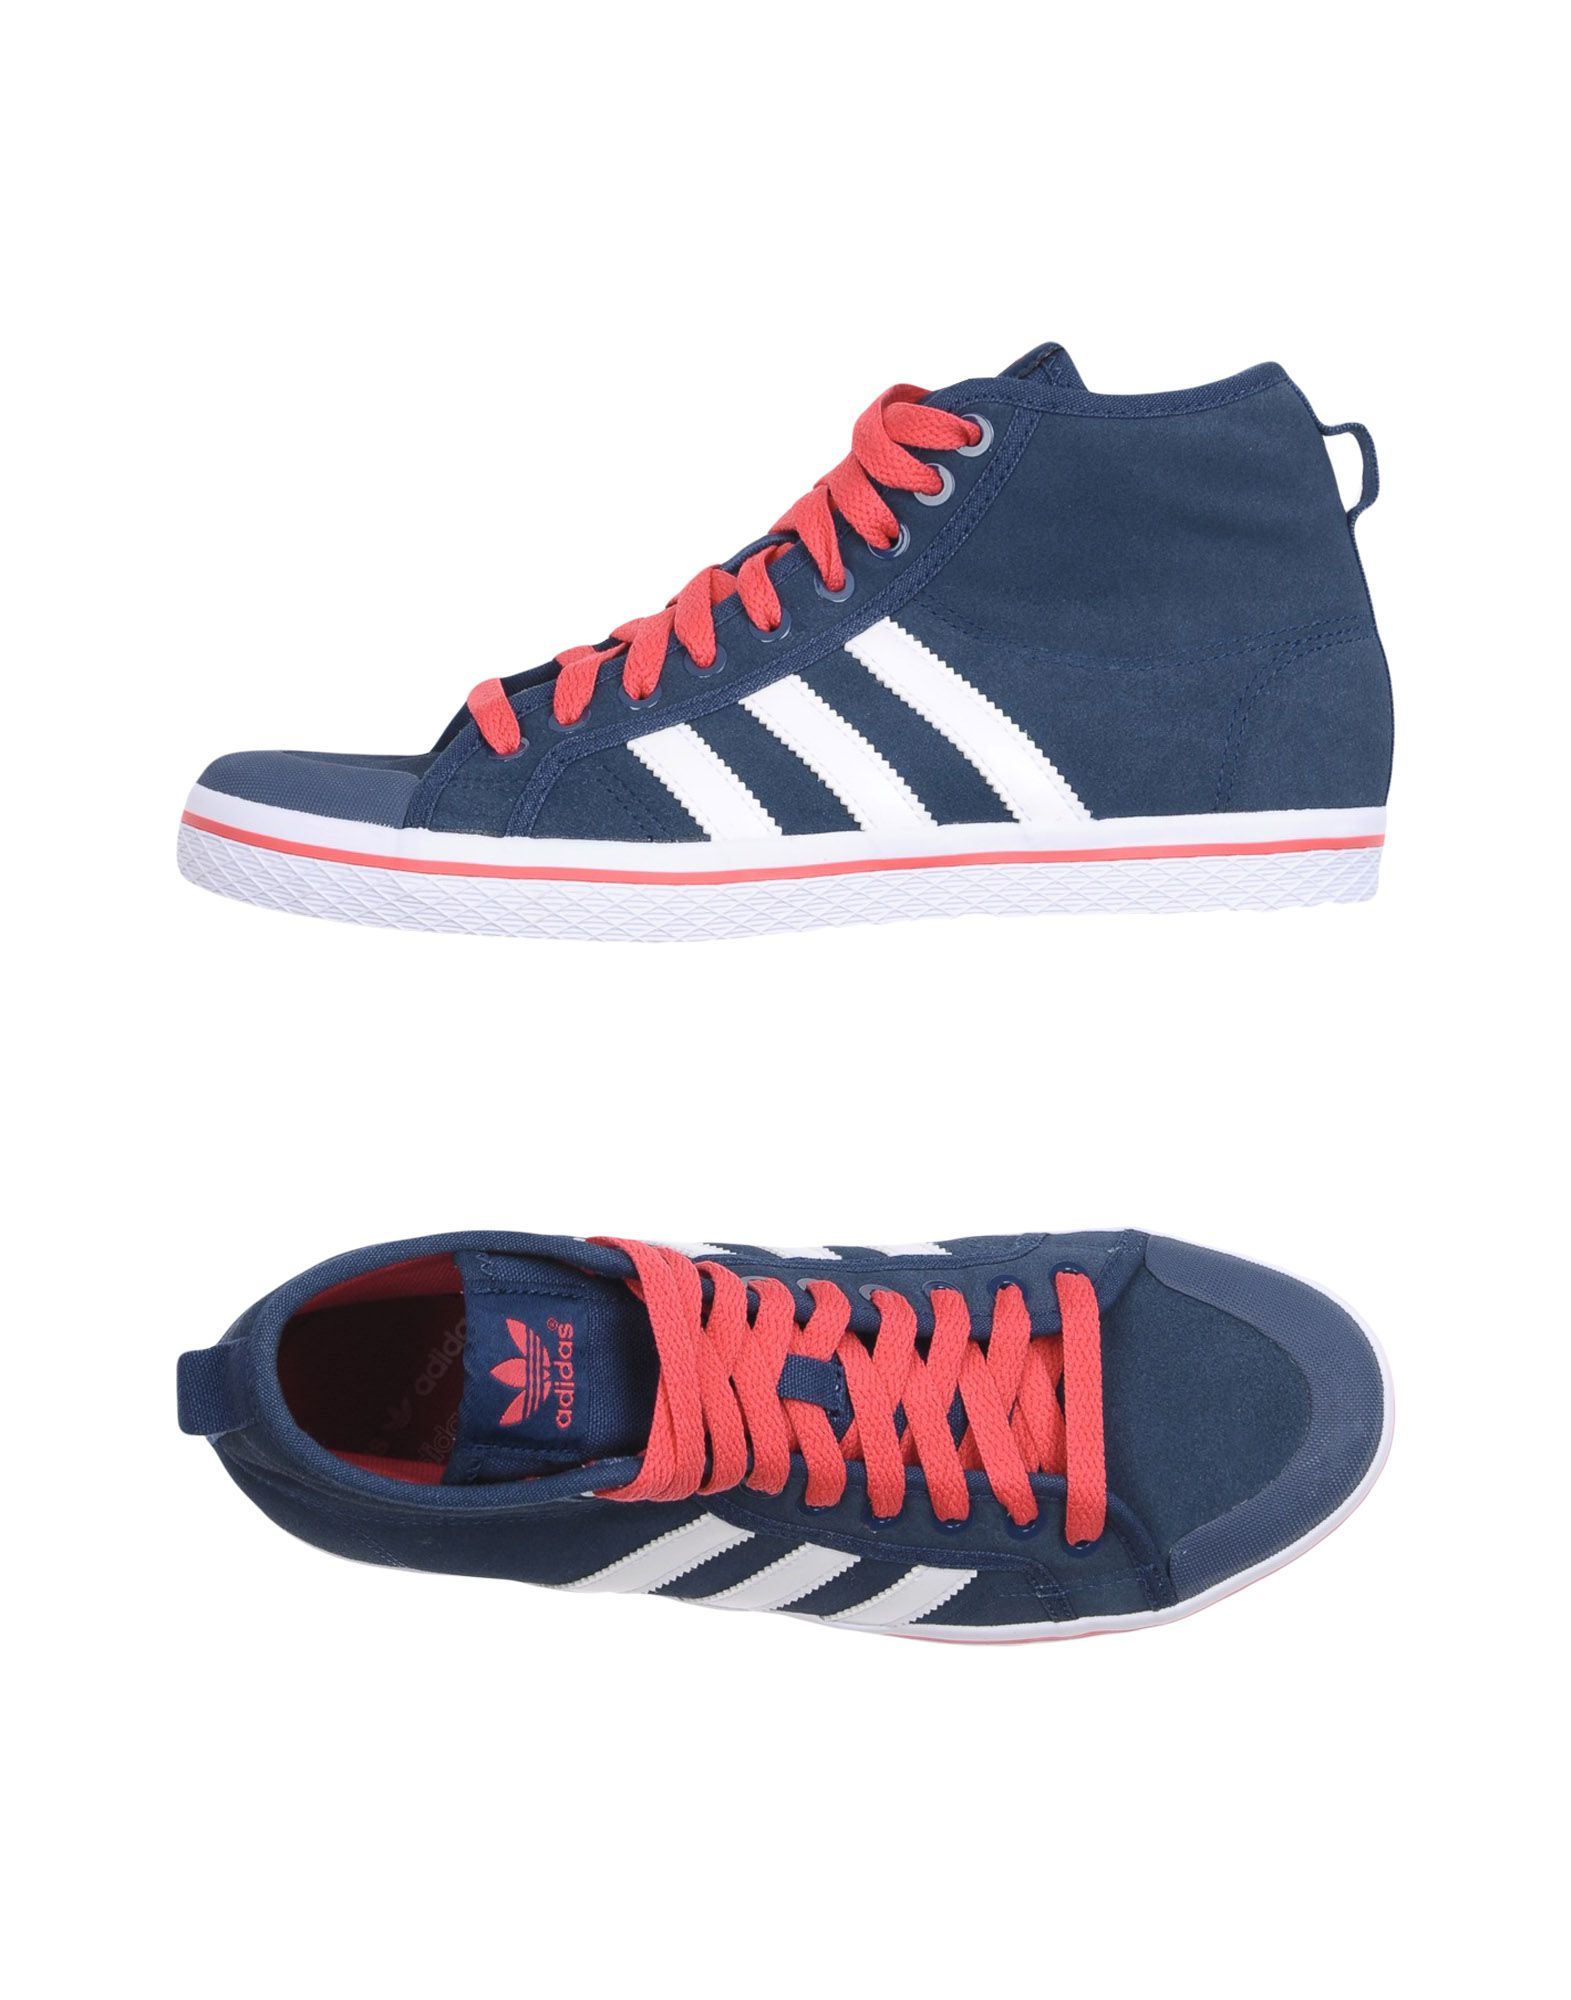 Adidas Originals Originals Sneakers - Women Adidas Originals Originals Sneakers online on  United Kingdom - 11242511IJ 674c6f